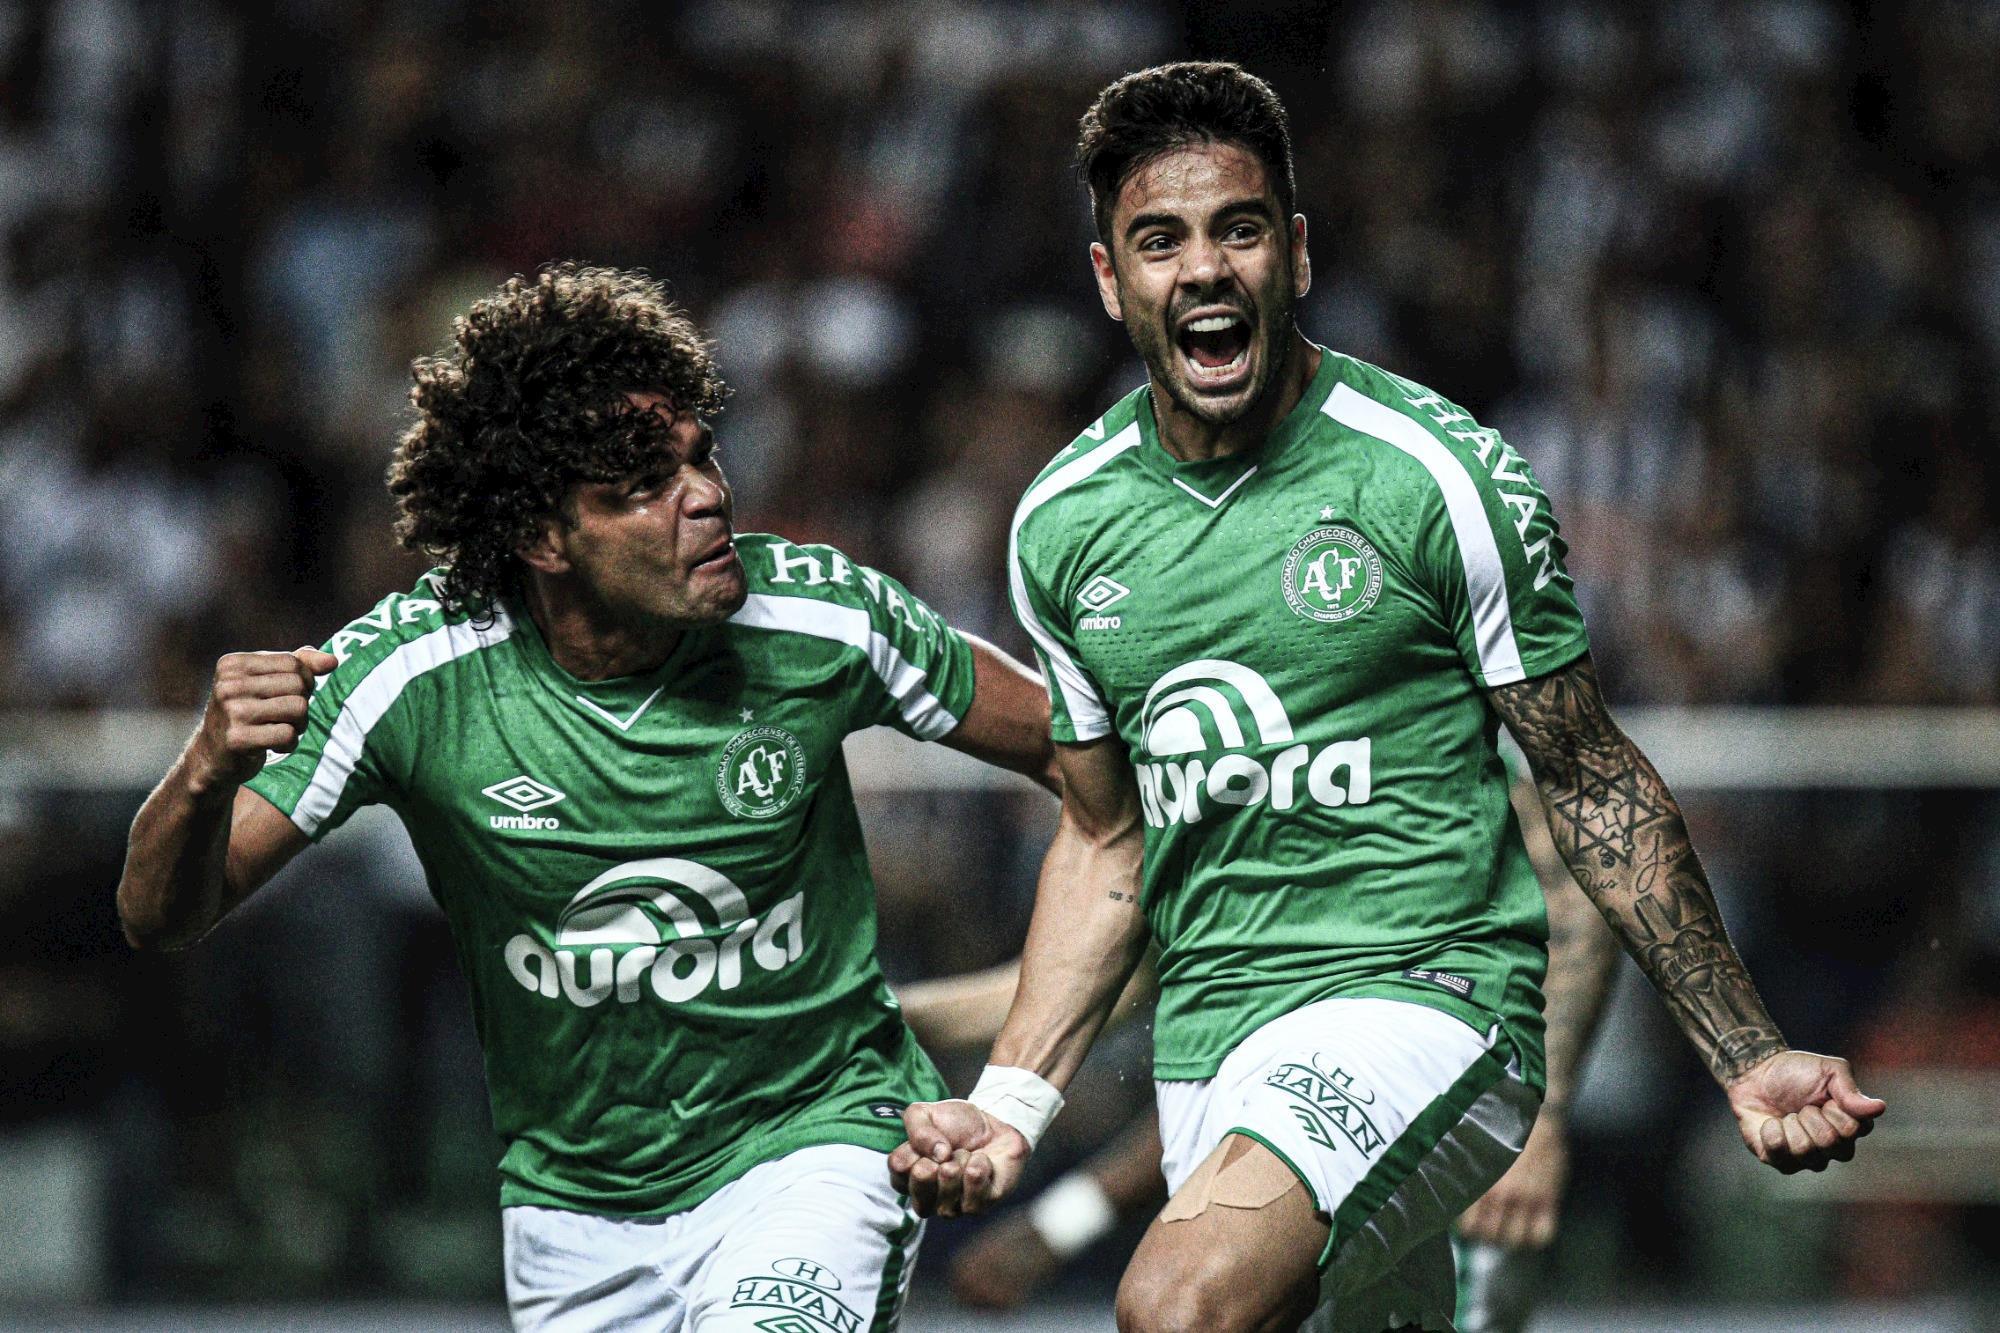 notícias, fotos atualizadas , Márcio Cunha / ACF